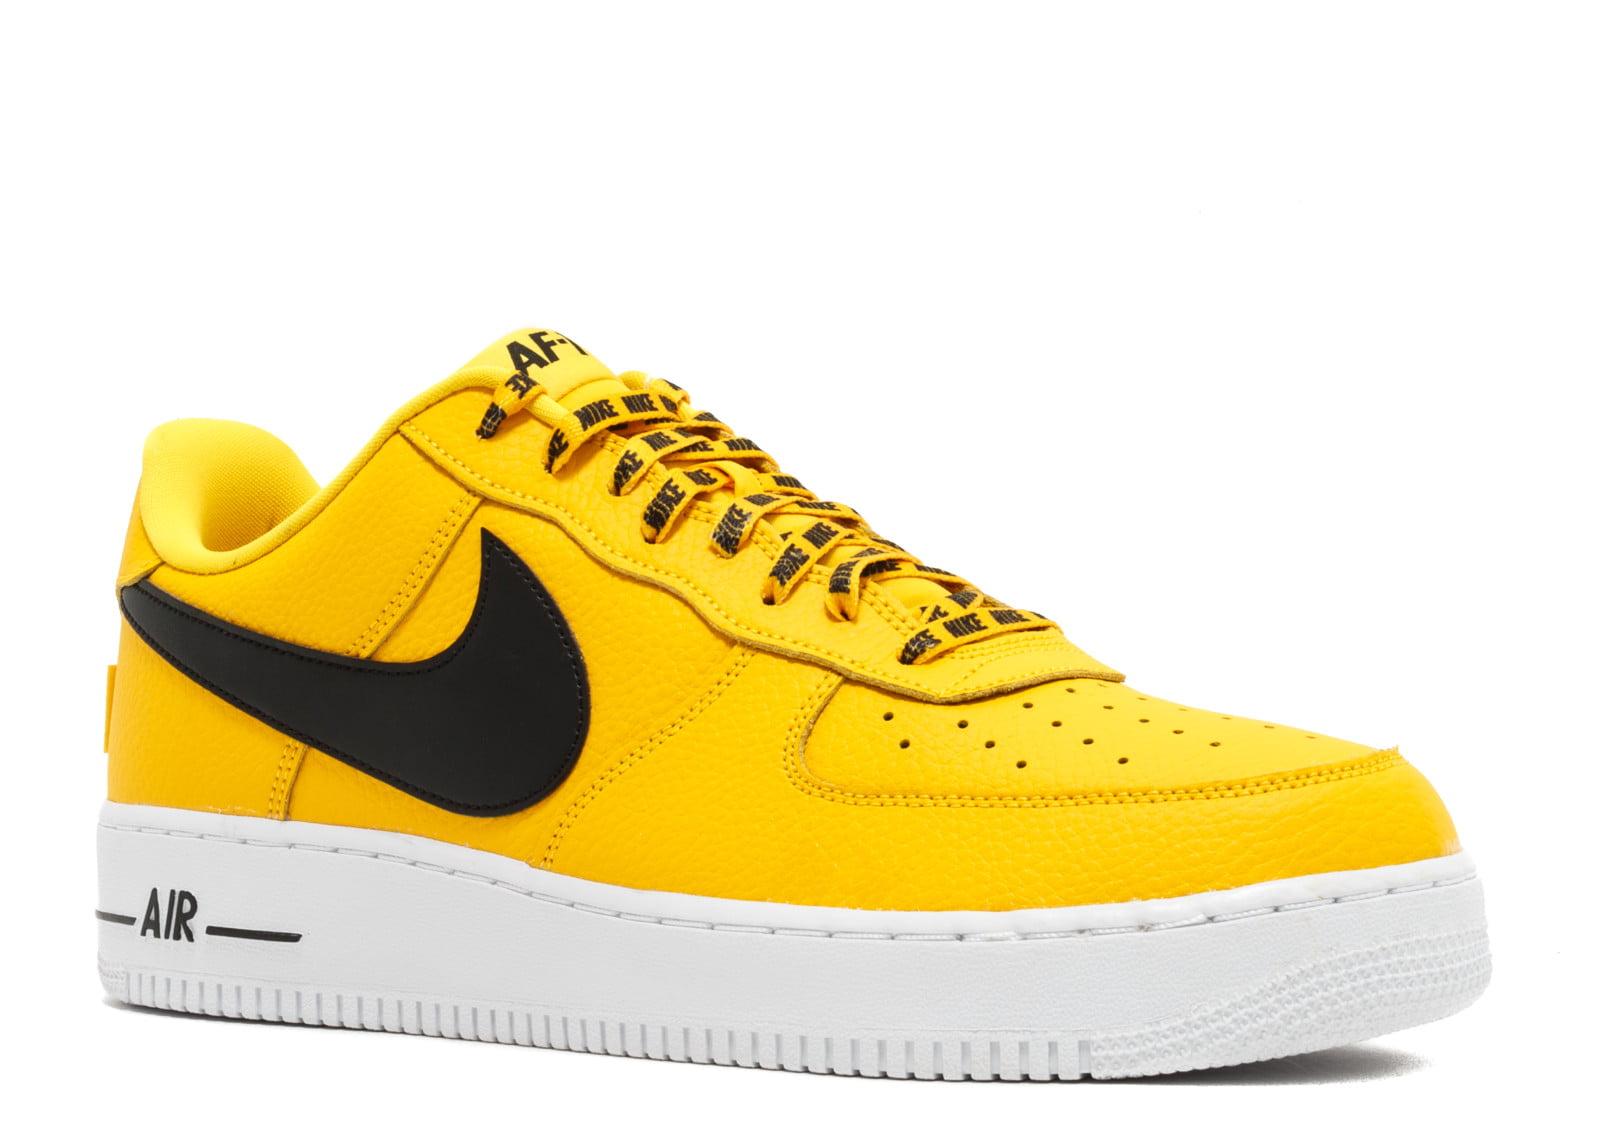 '07 823511 Nike 701 'nba Pack' 11 Force Men Lv8 Air Size 1 HE9DW2I